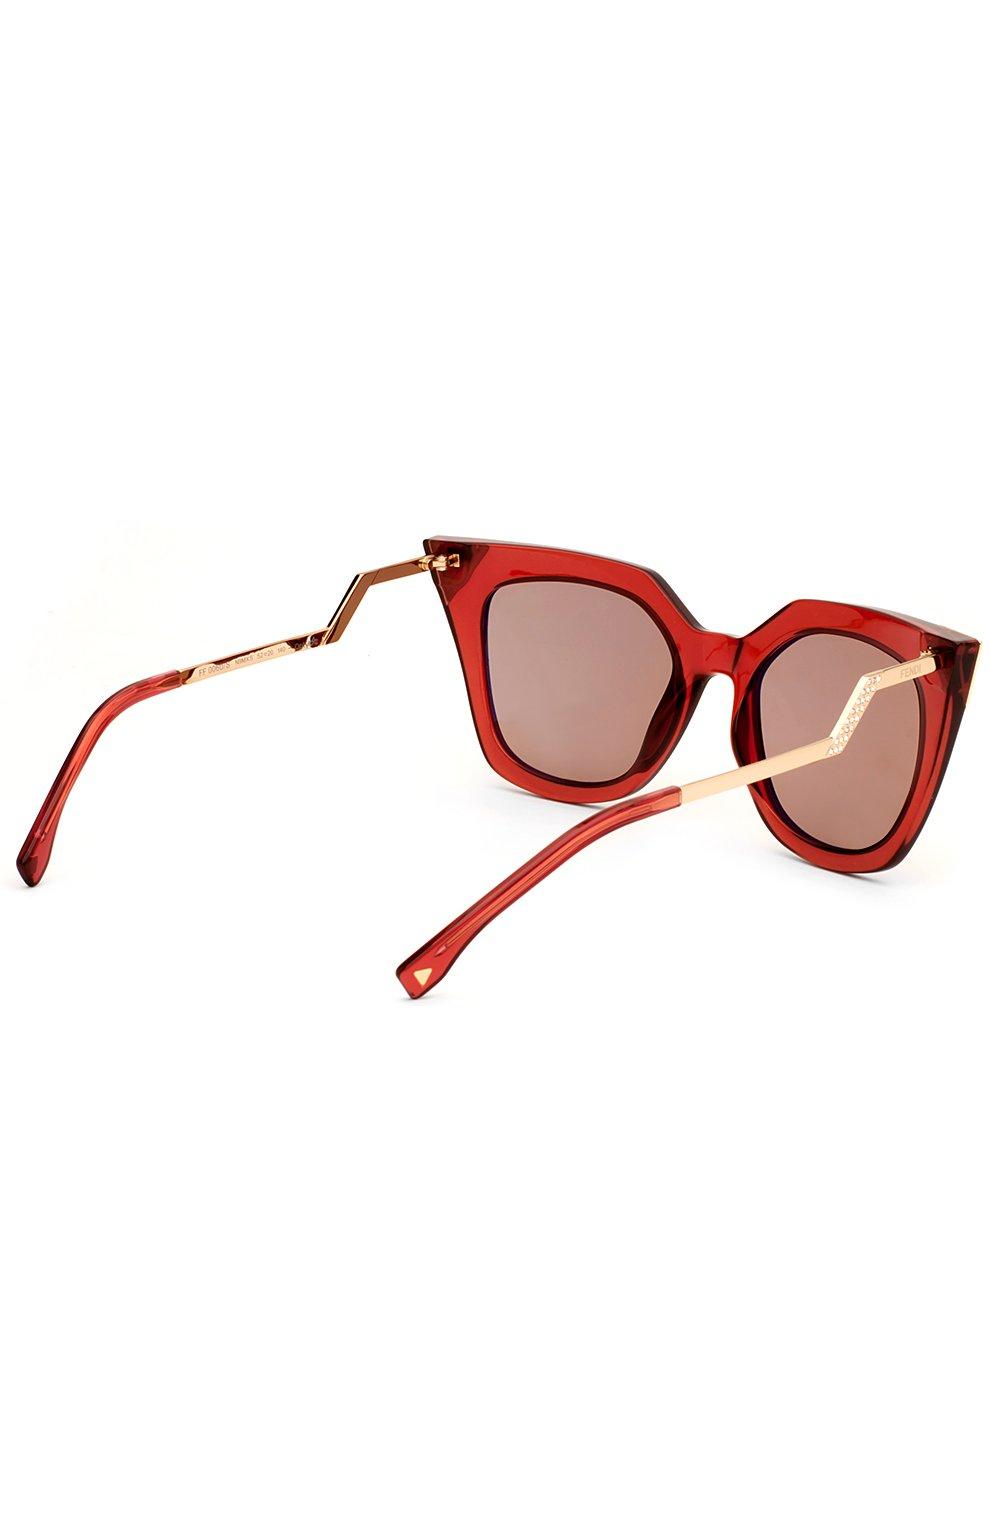 Женские солнцезащитные очки FENDI красного цвета, арт. 0060 N9M | Фото 3